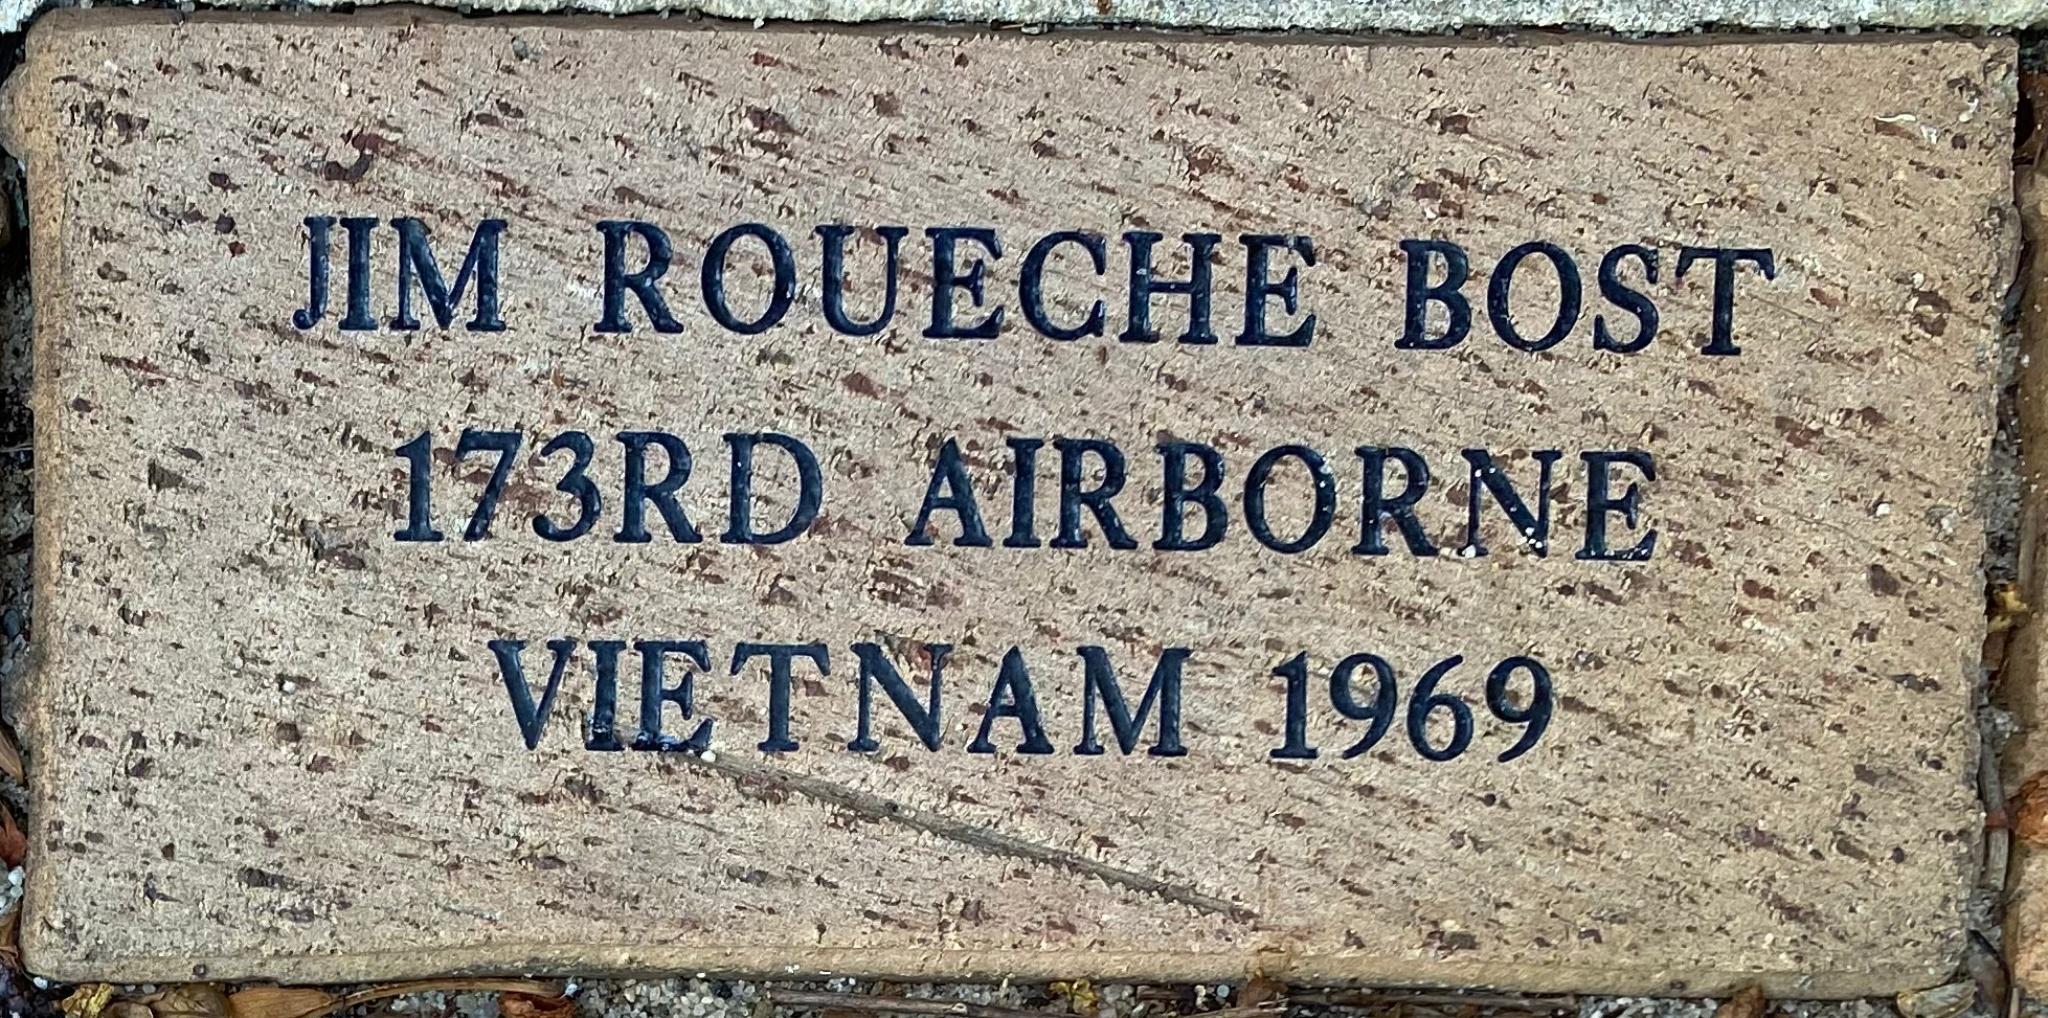 JIM ROUECHE BOST 173RD AIRBORNE VIETNAM 1969